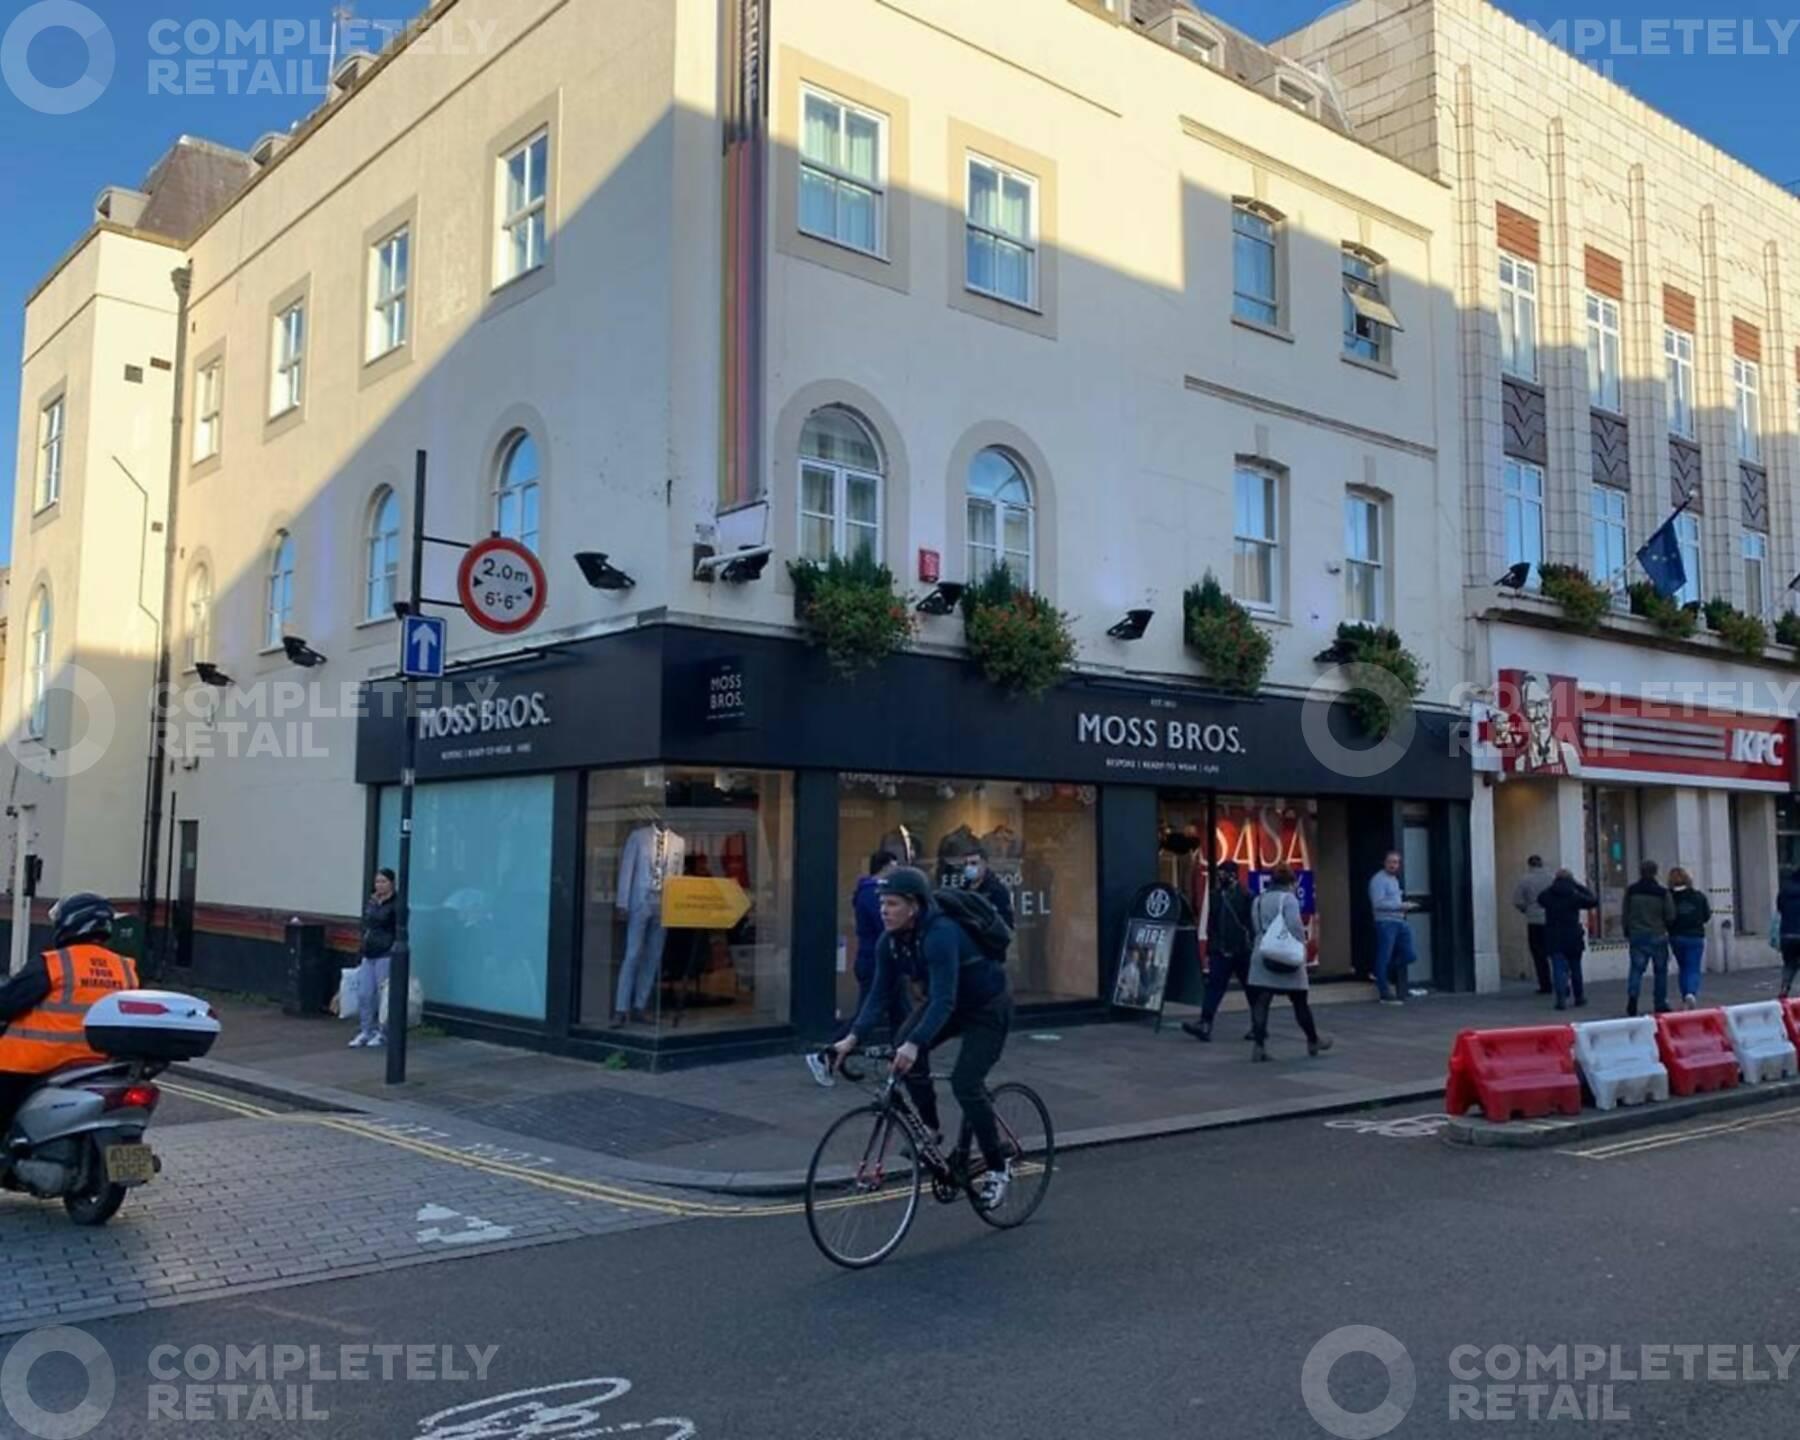 92/94 King Street, Hammersmith